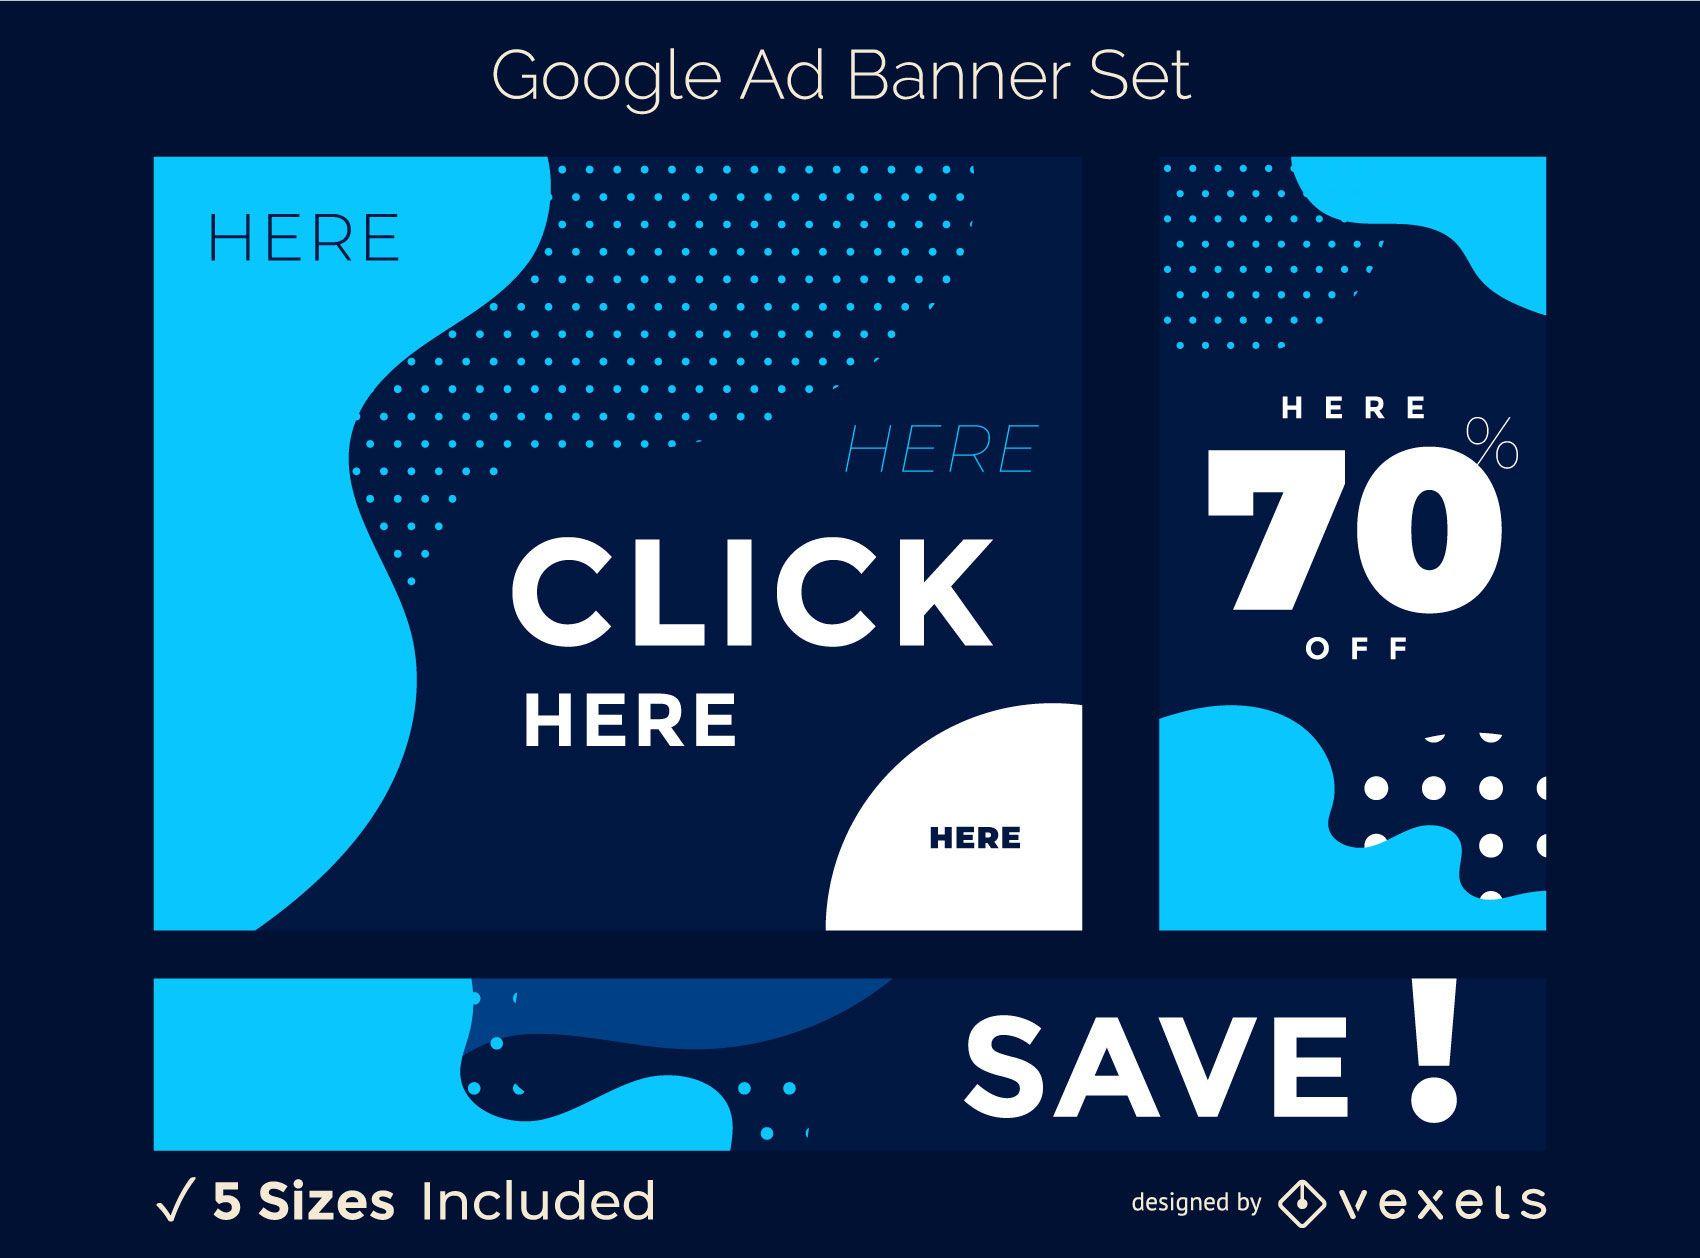 Conjunto de banners editables de Google Ads